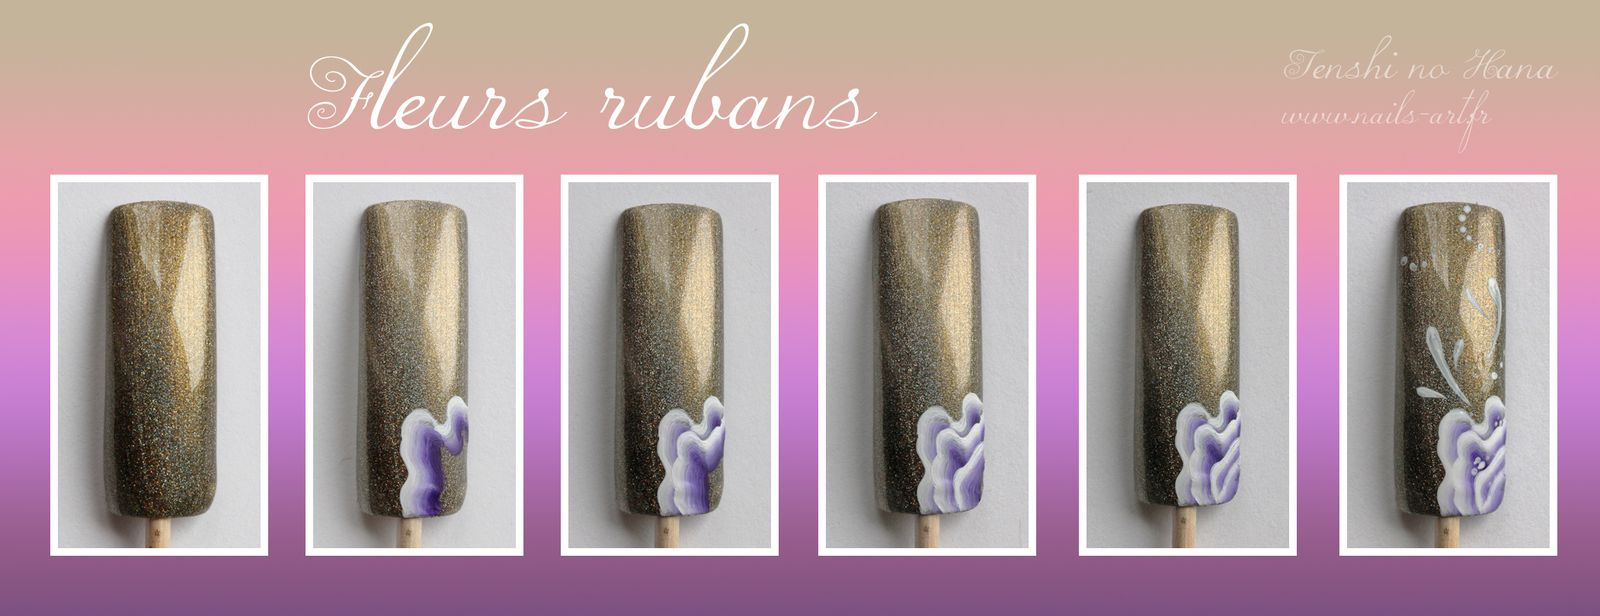 Tuto photos nail art fleurs rubans nature nails nail art - Tuto nail art debutant ...